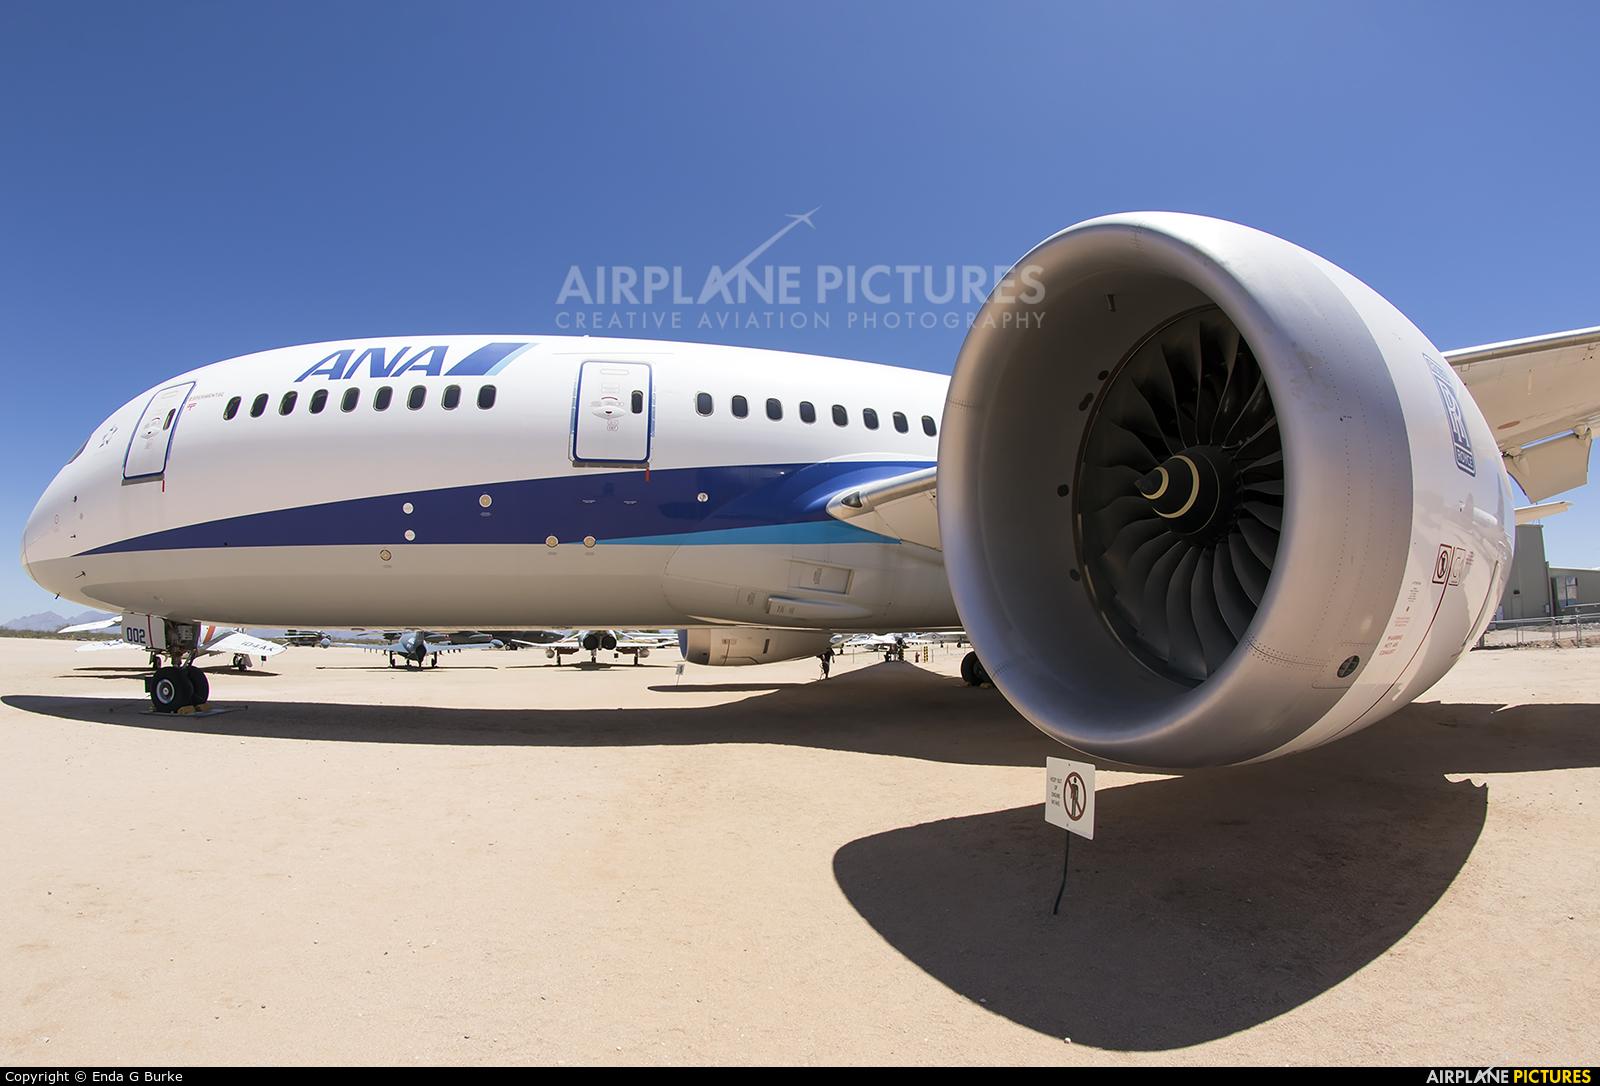 ANA - All Nippon Airways N787EX aircraft at Tucson - Pima Air & Space Museum